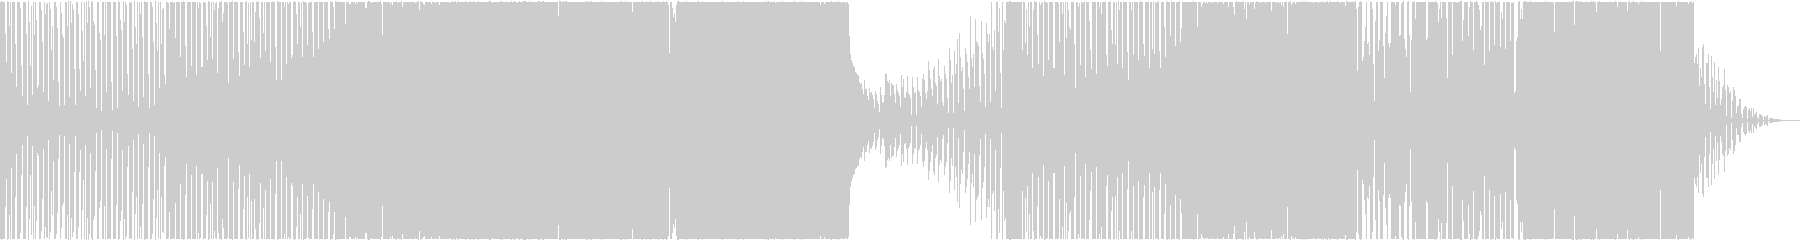 Cyberpunk ダークエレクトロの未再生の波形